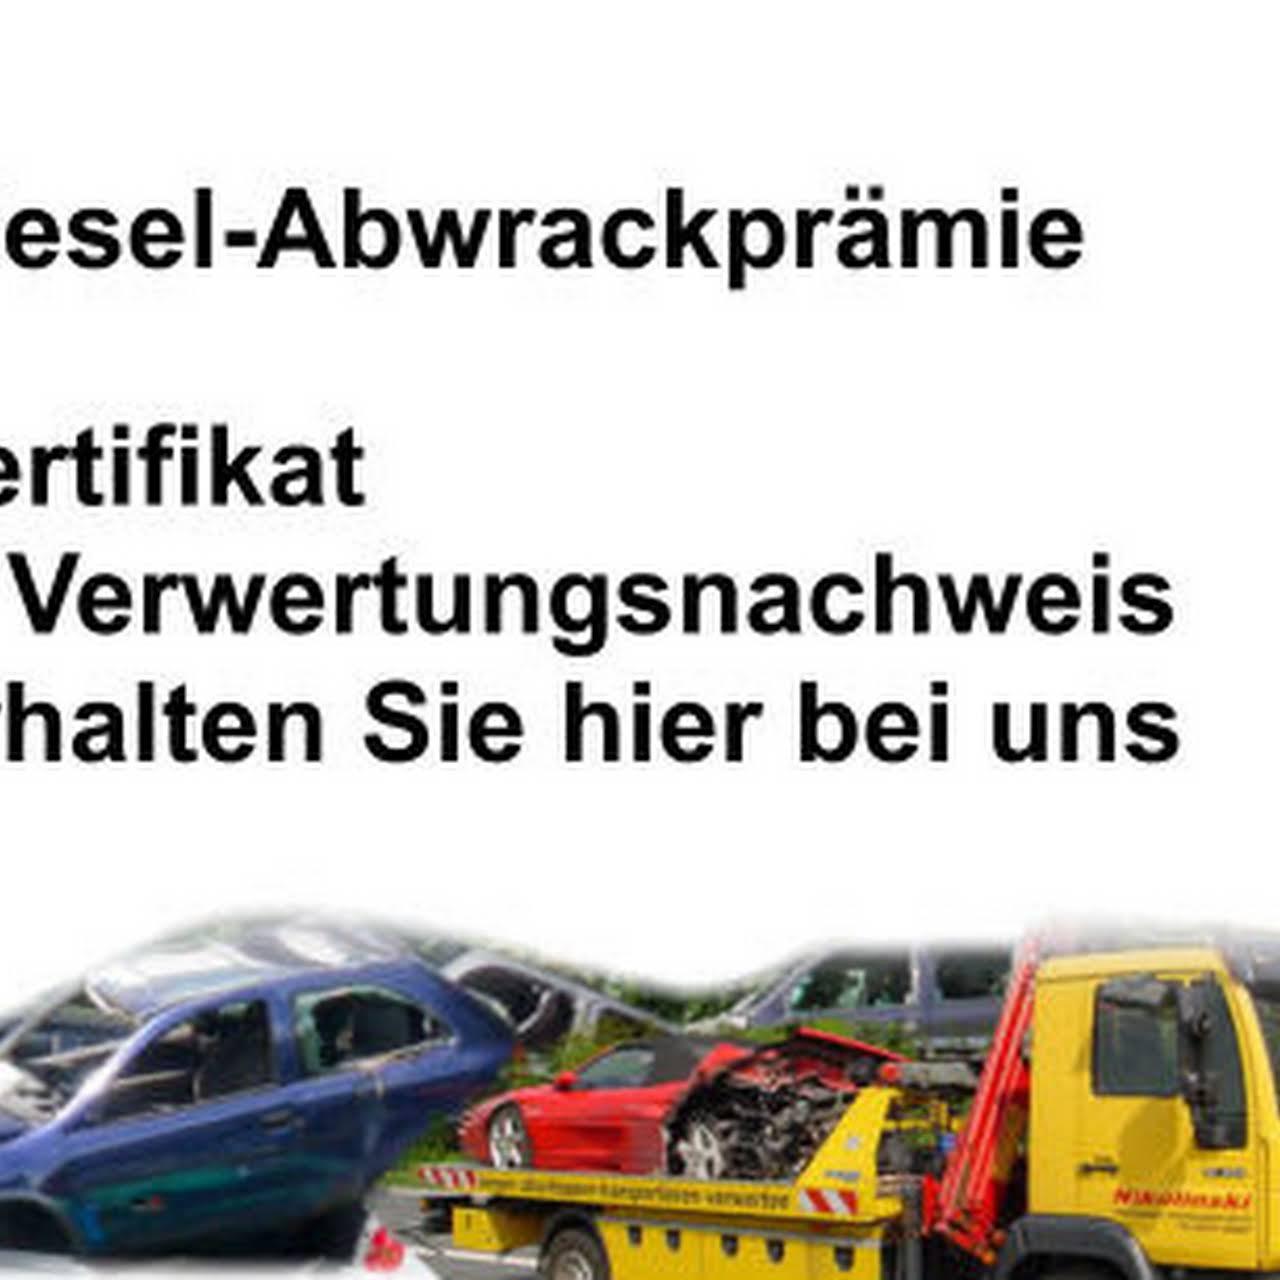 Nikolinski GmbH & Co. KG - Autoverwertung in Velbert